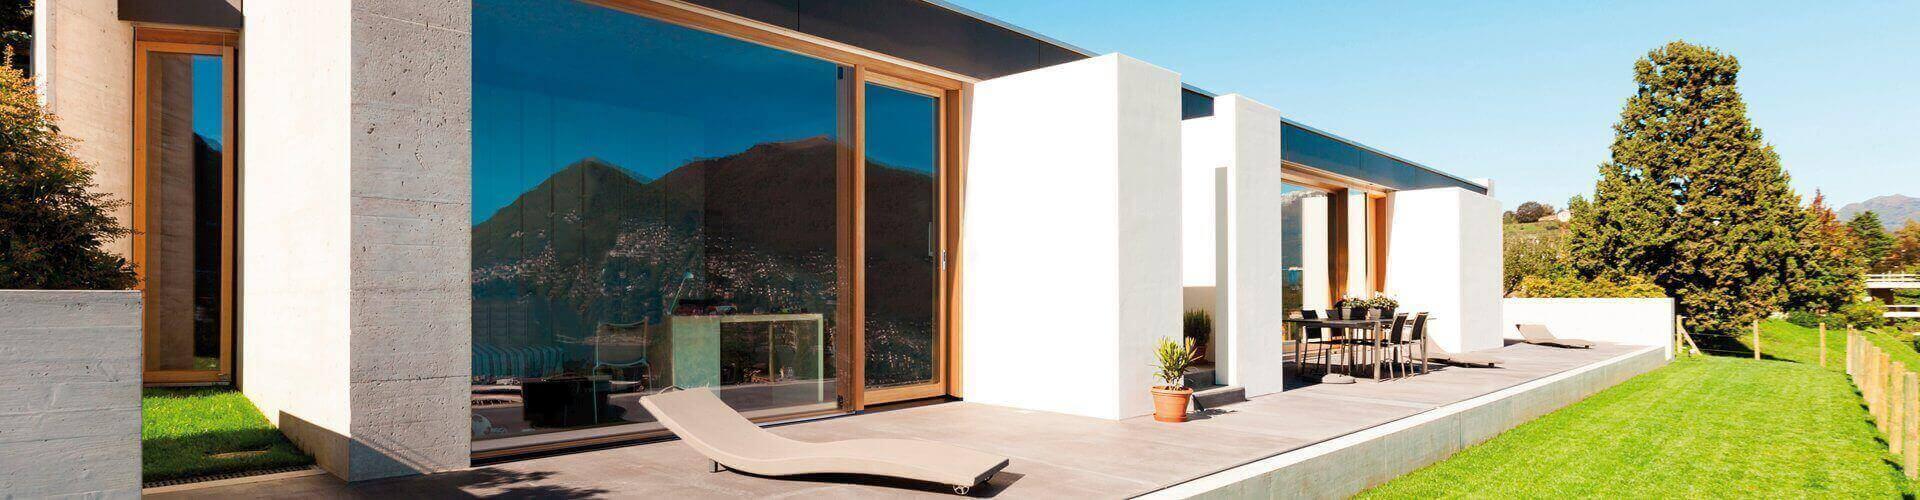 imago-liftslide-doors-on-villa